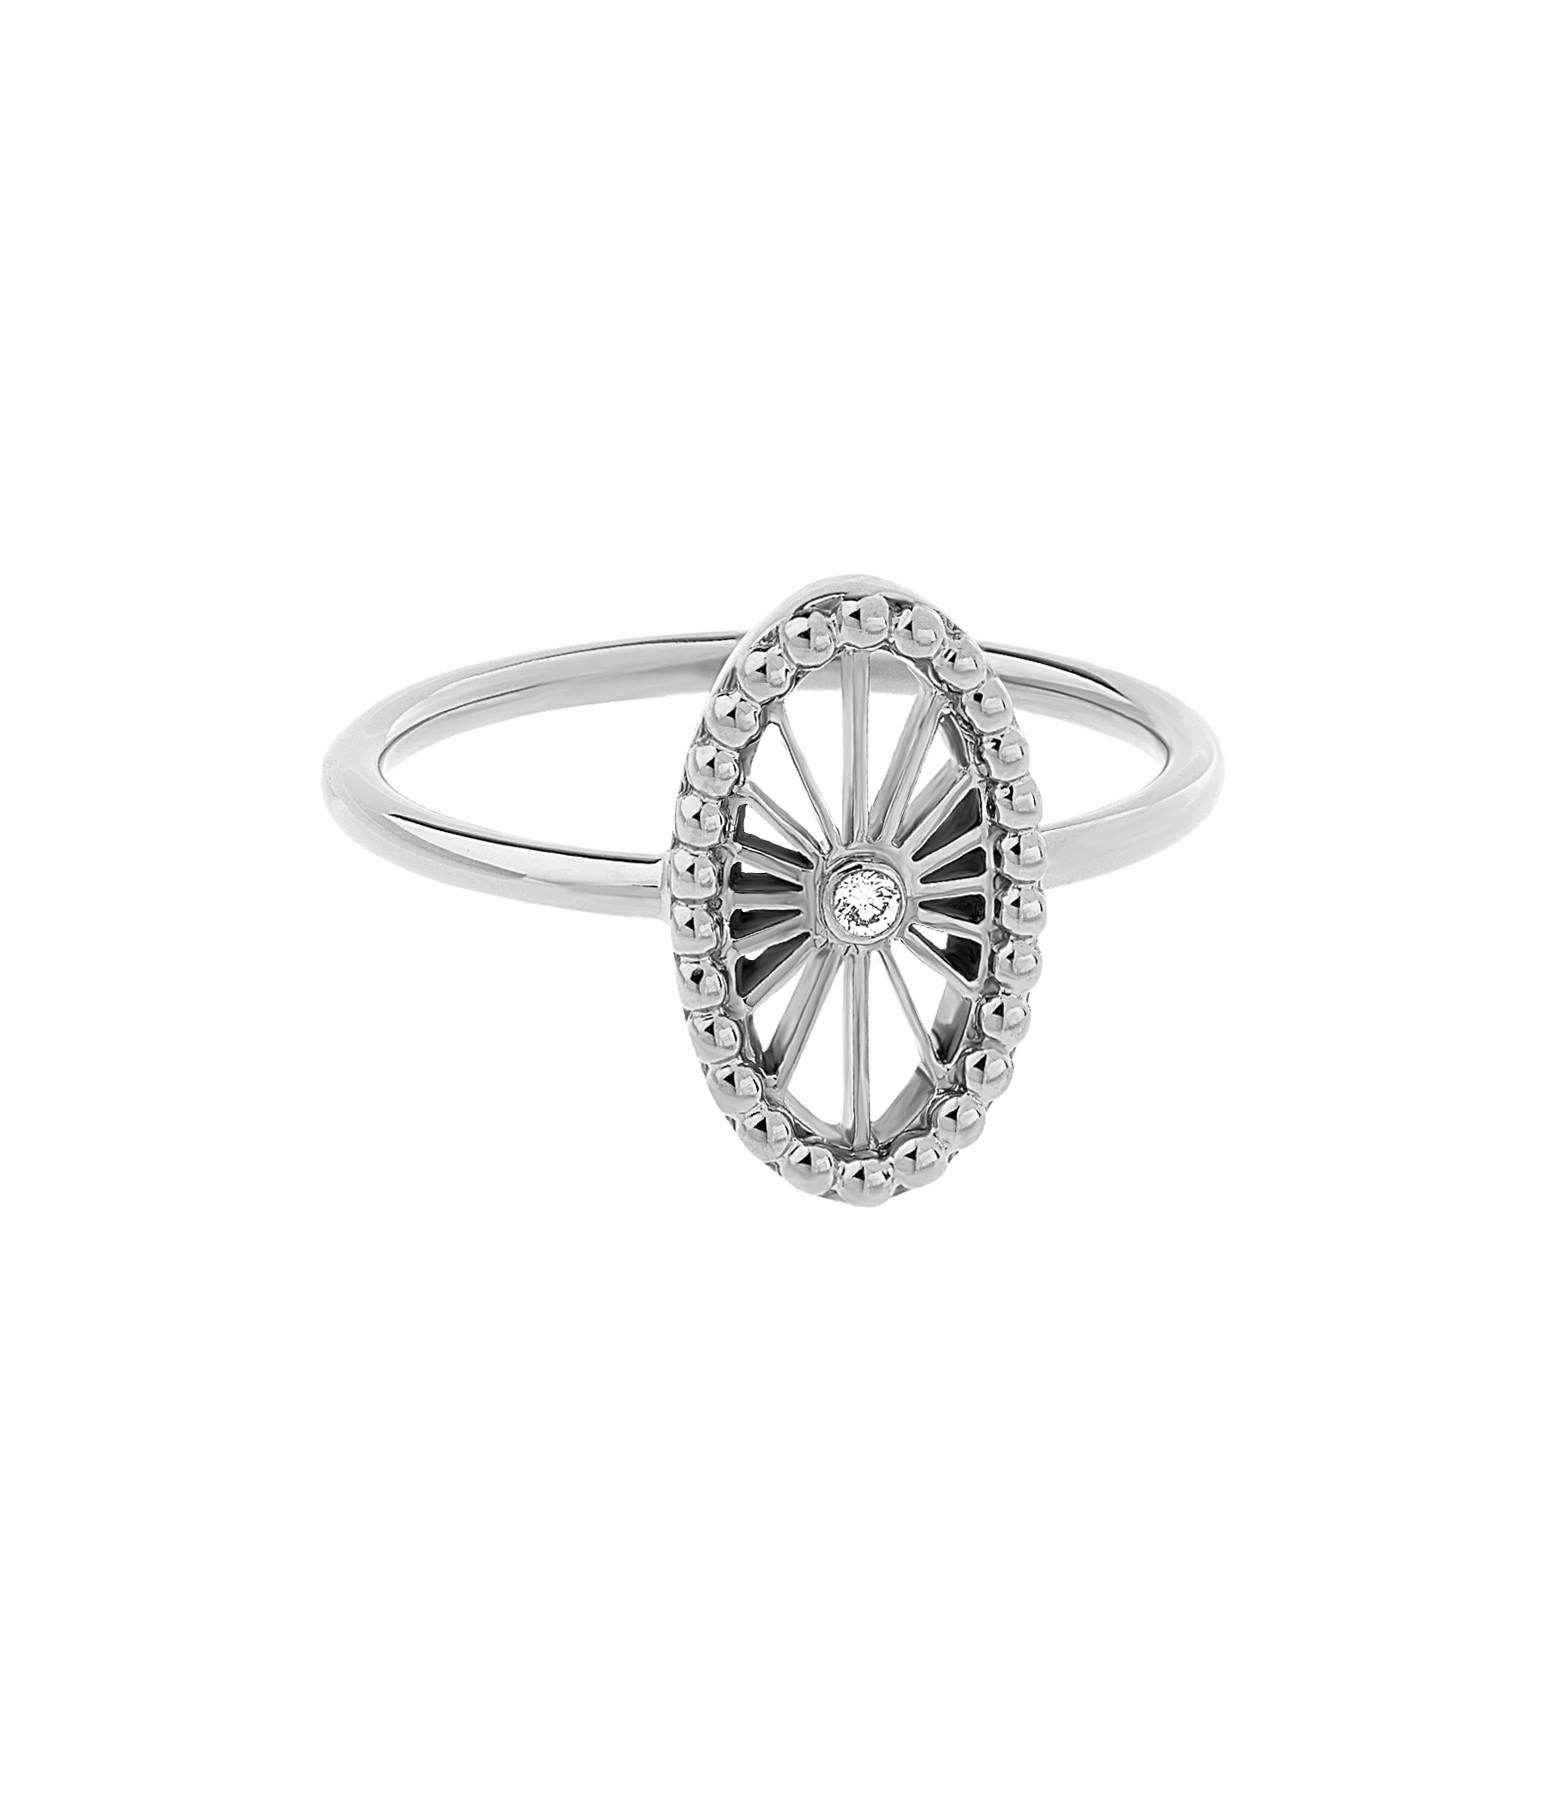 NAVA JOAILLERIE - Bague Mini-Cheyenne Ovale Diamants Or Blanc